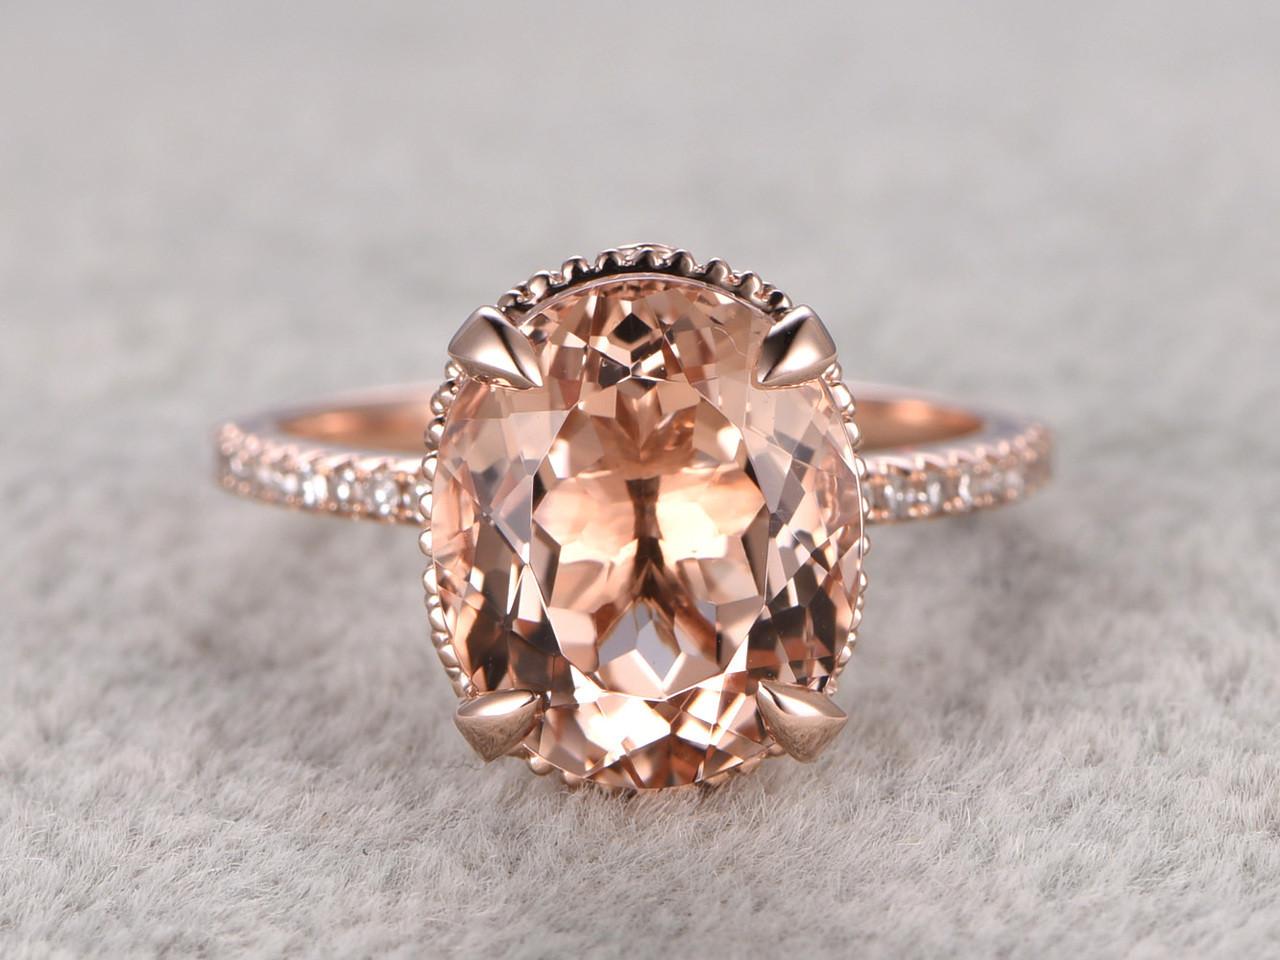 9x11mm Oval 45 Carat Morganite Engagement Ring Diamond Wedding Ring 14k Rose  Gold Filigree Retro Vintage